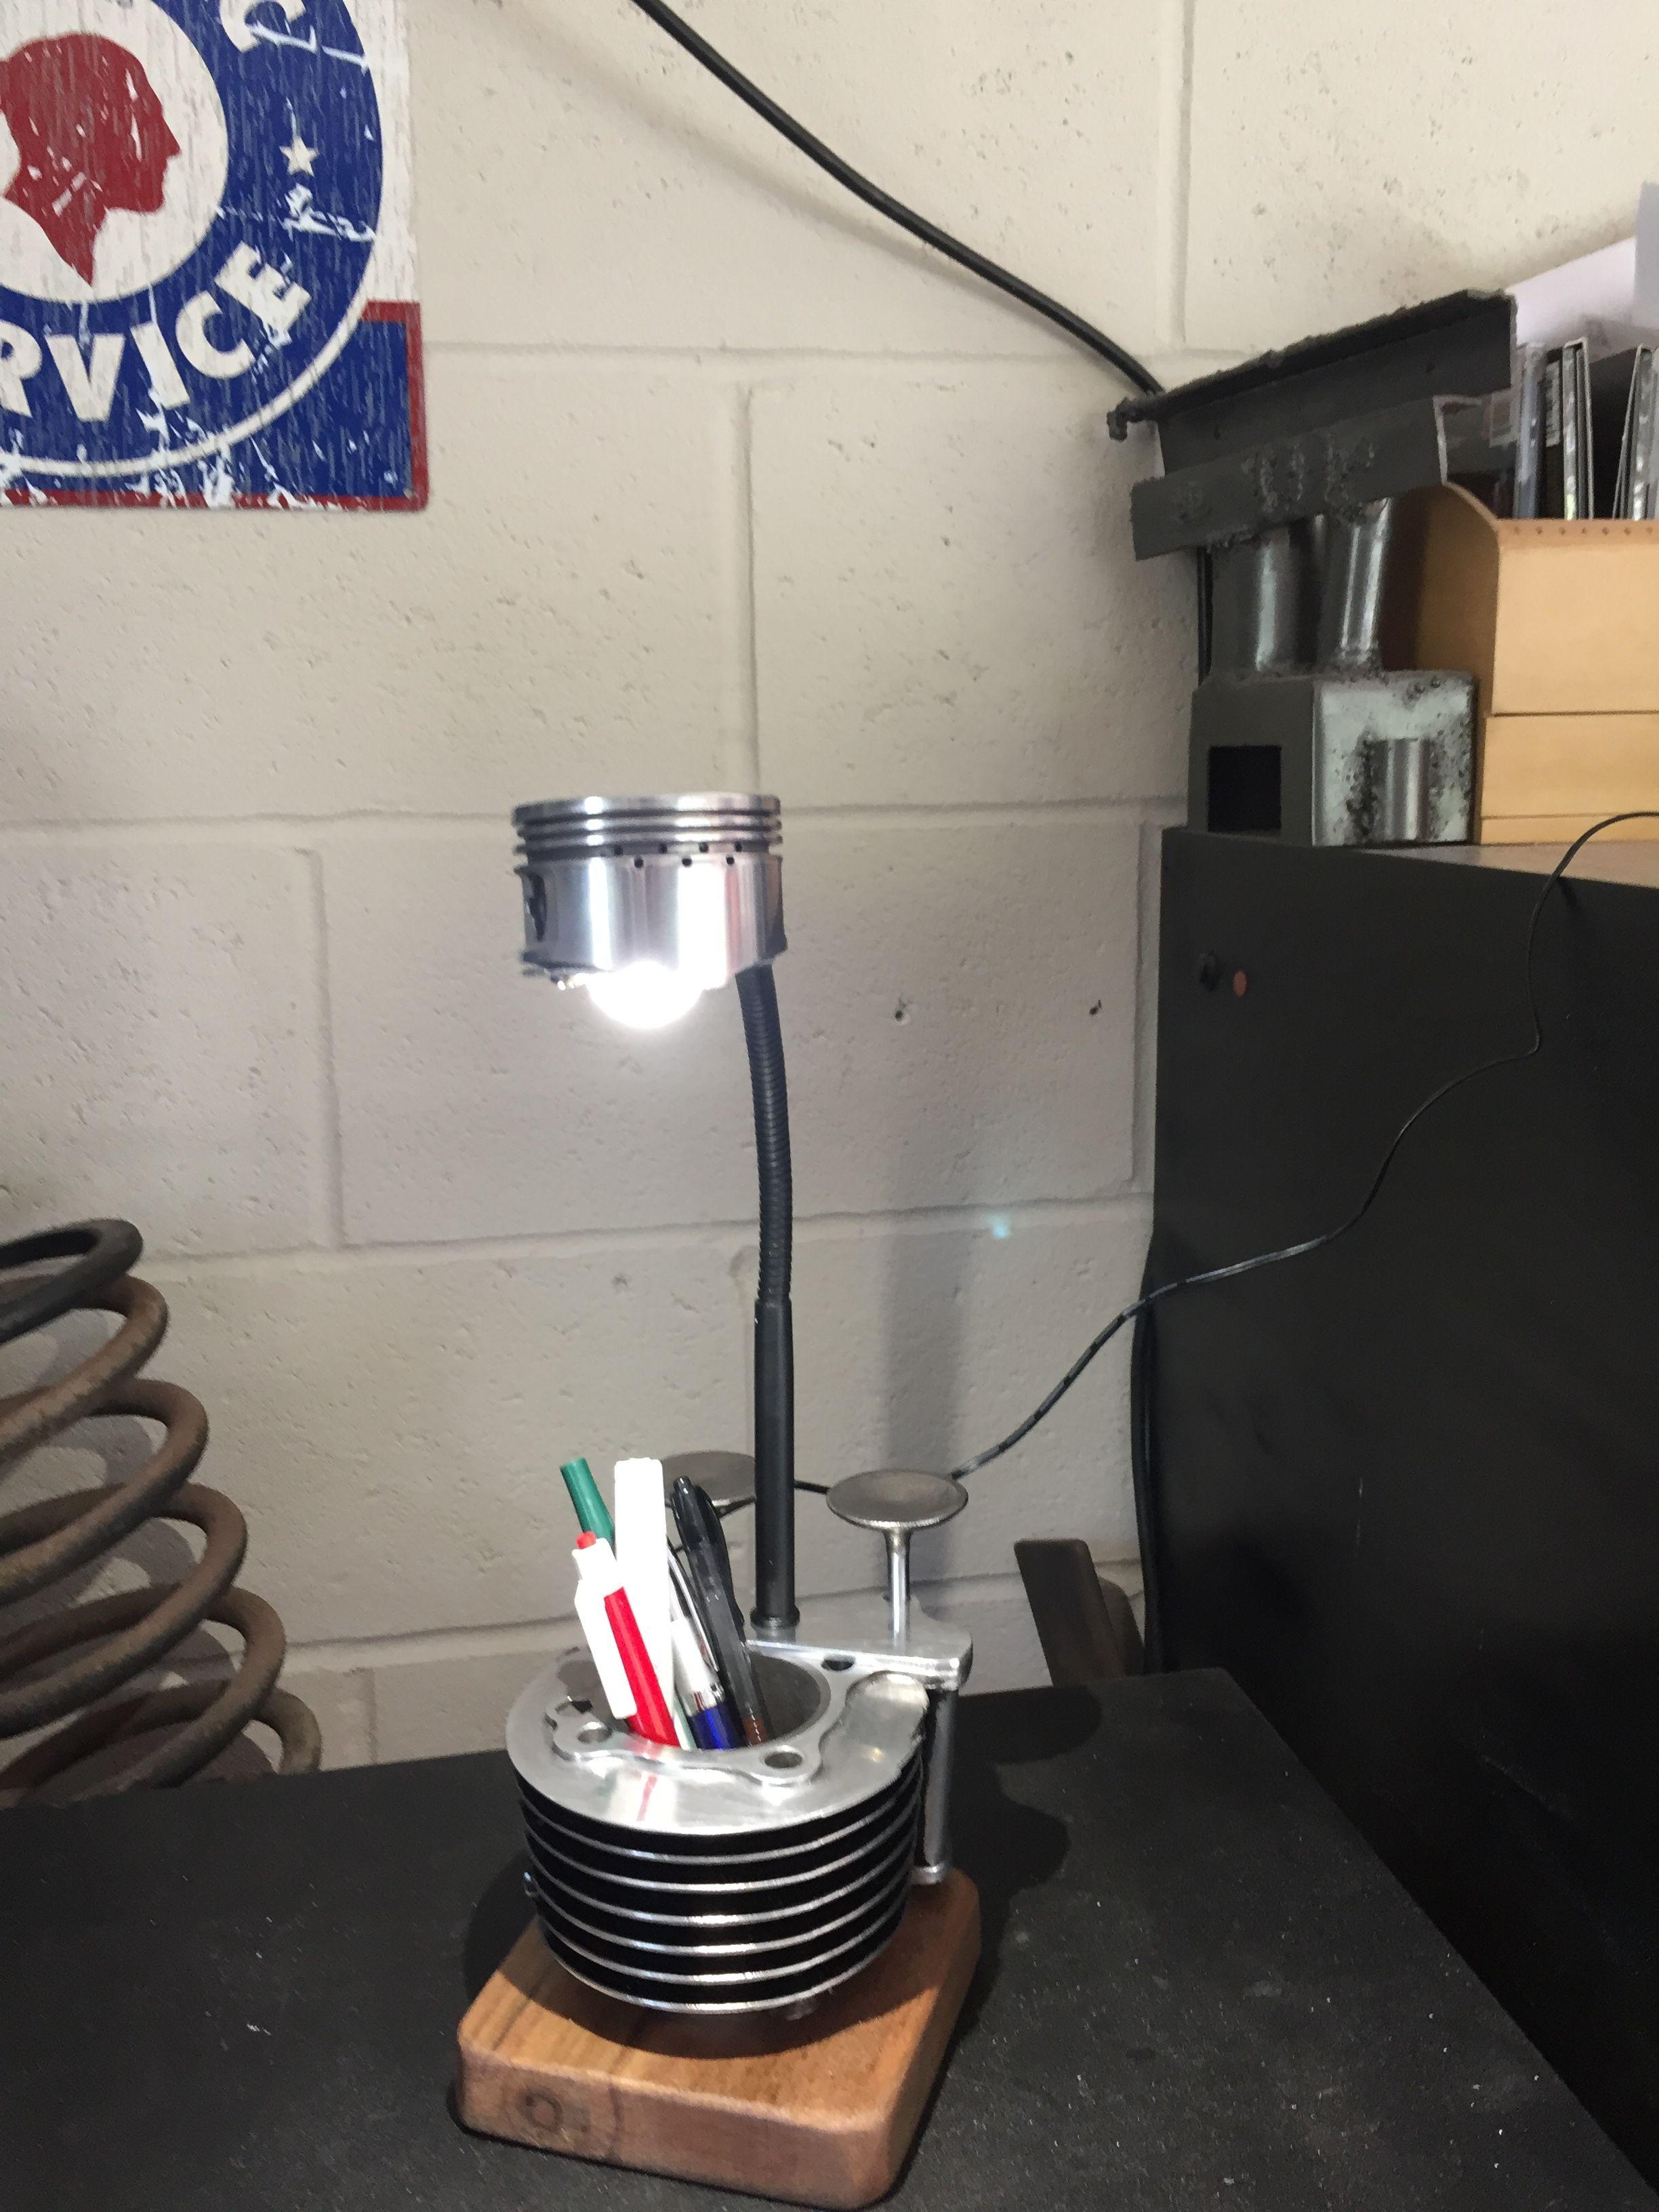 Desk Lamp Made From Motorcycle Parts Automotive Decor Car Parts Decor Car Part Furniture